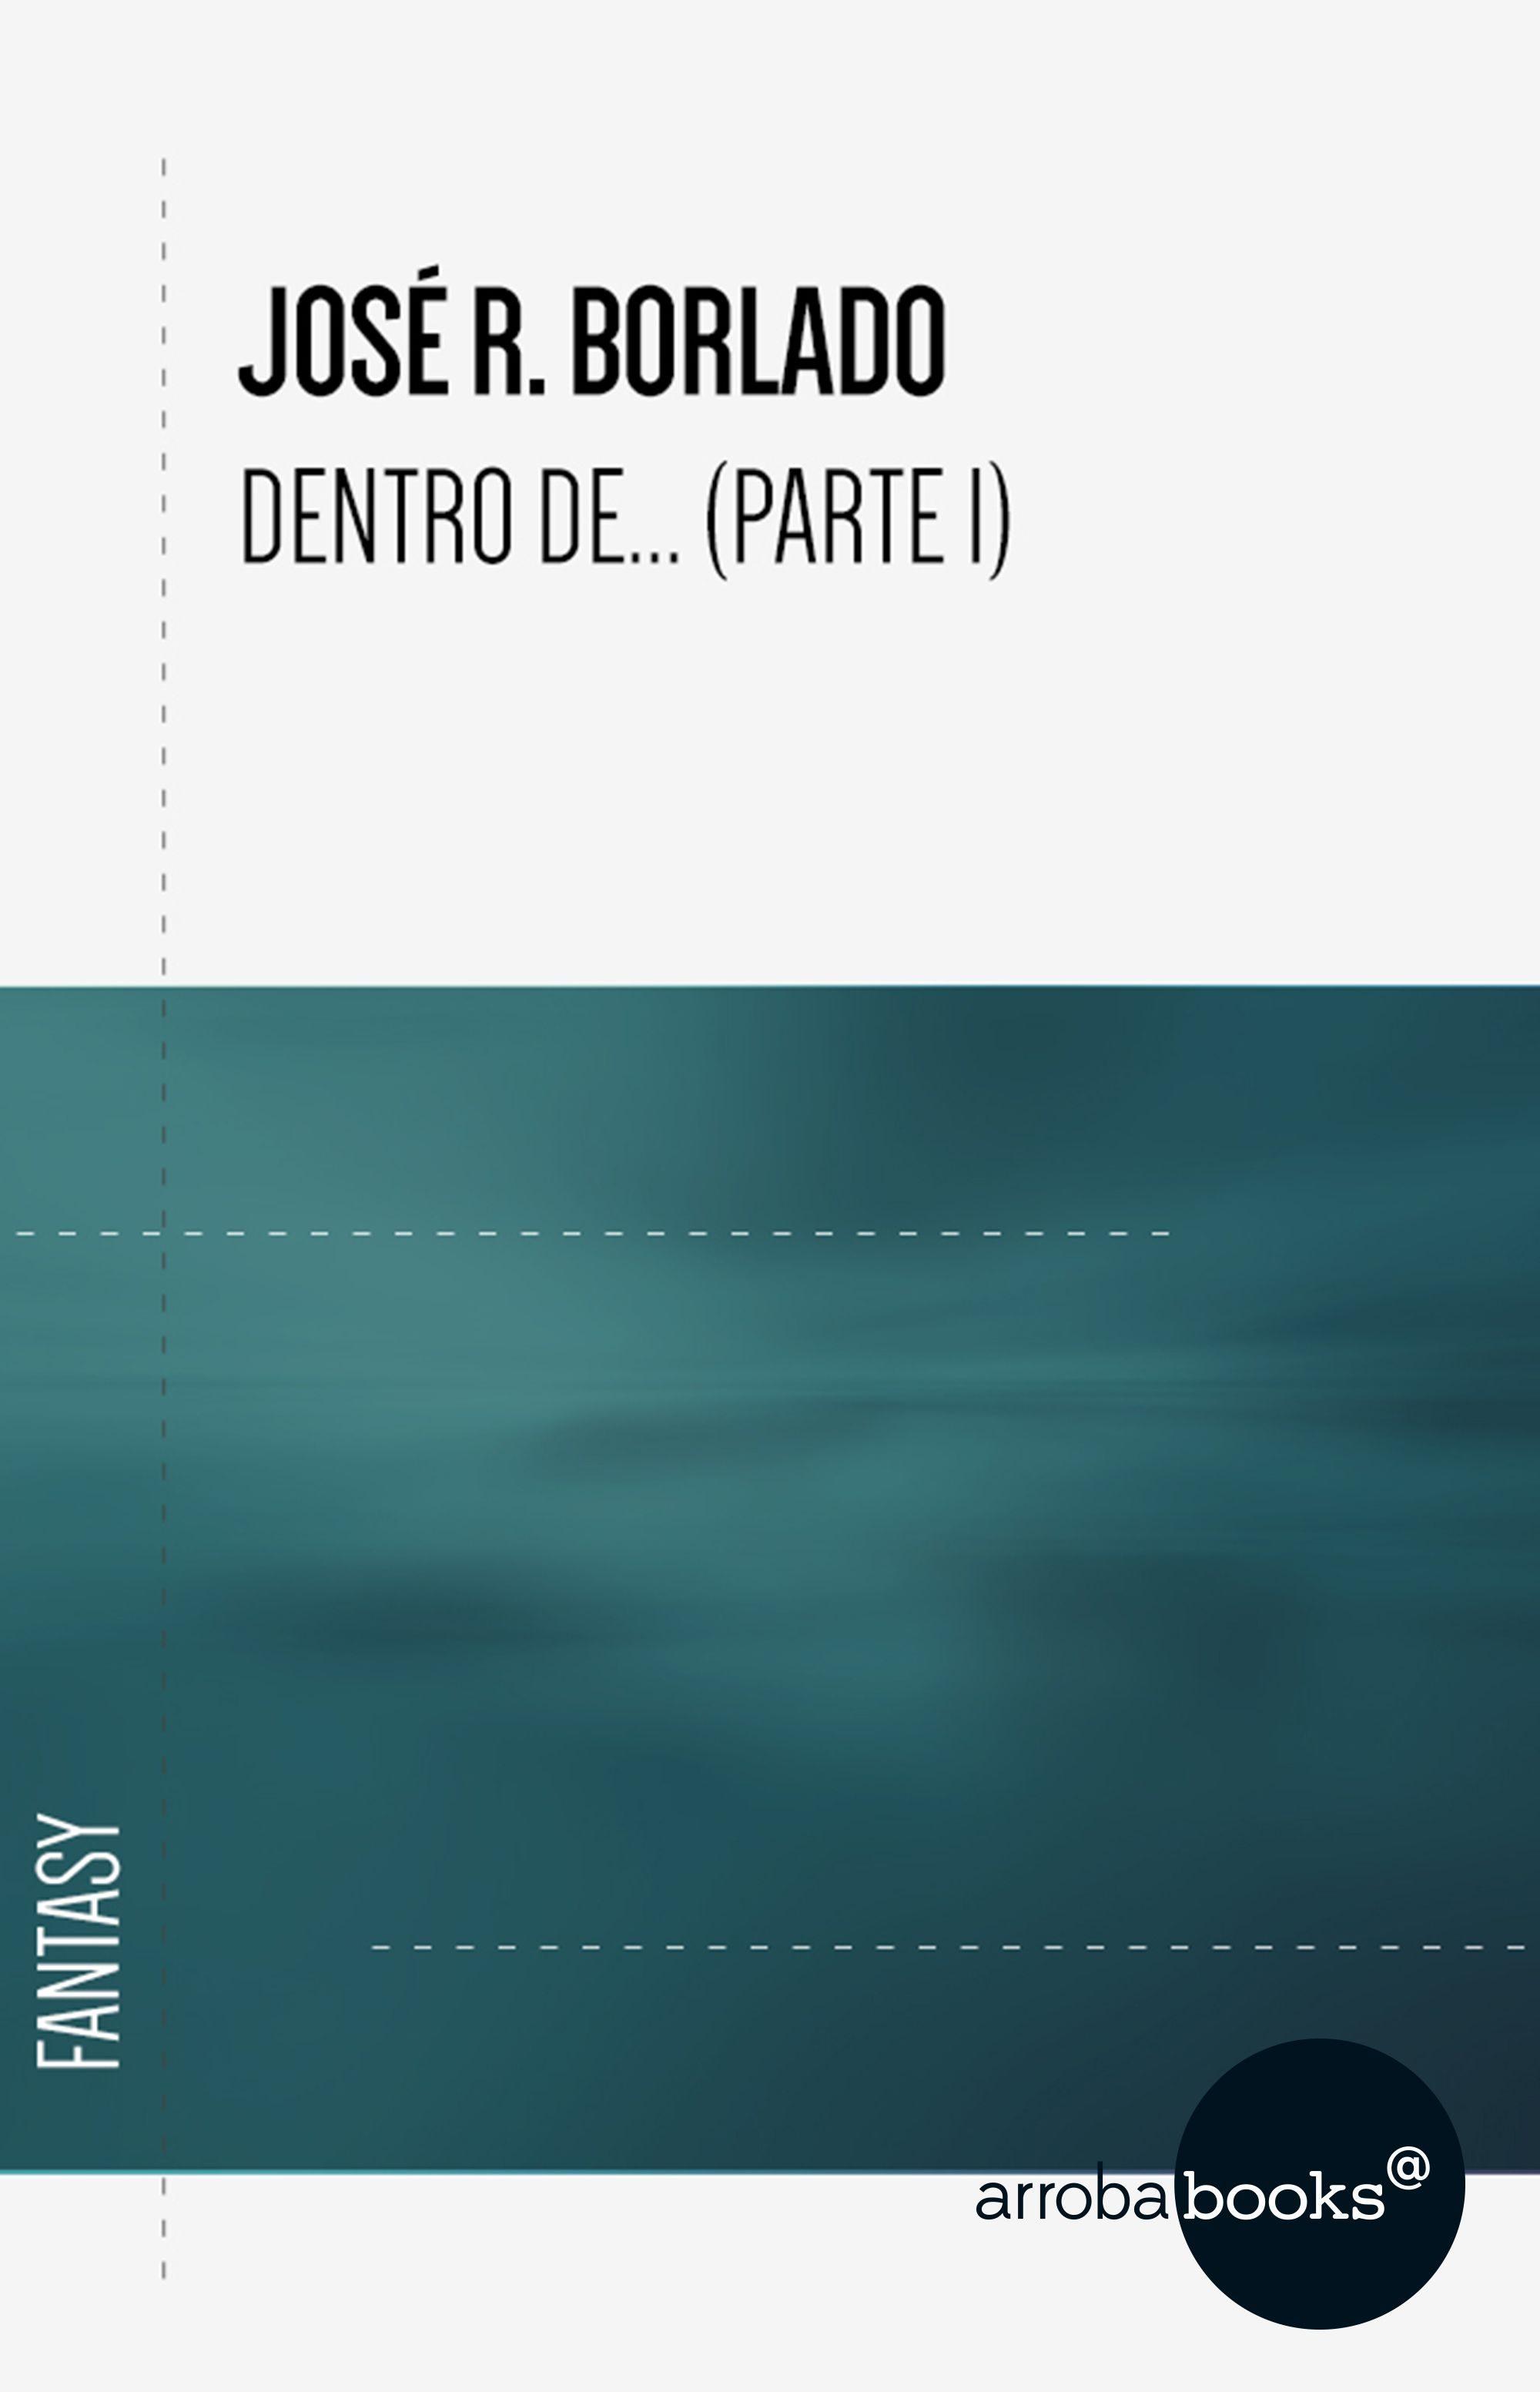 Dentro De (parte I)   por José R. Borlado epub